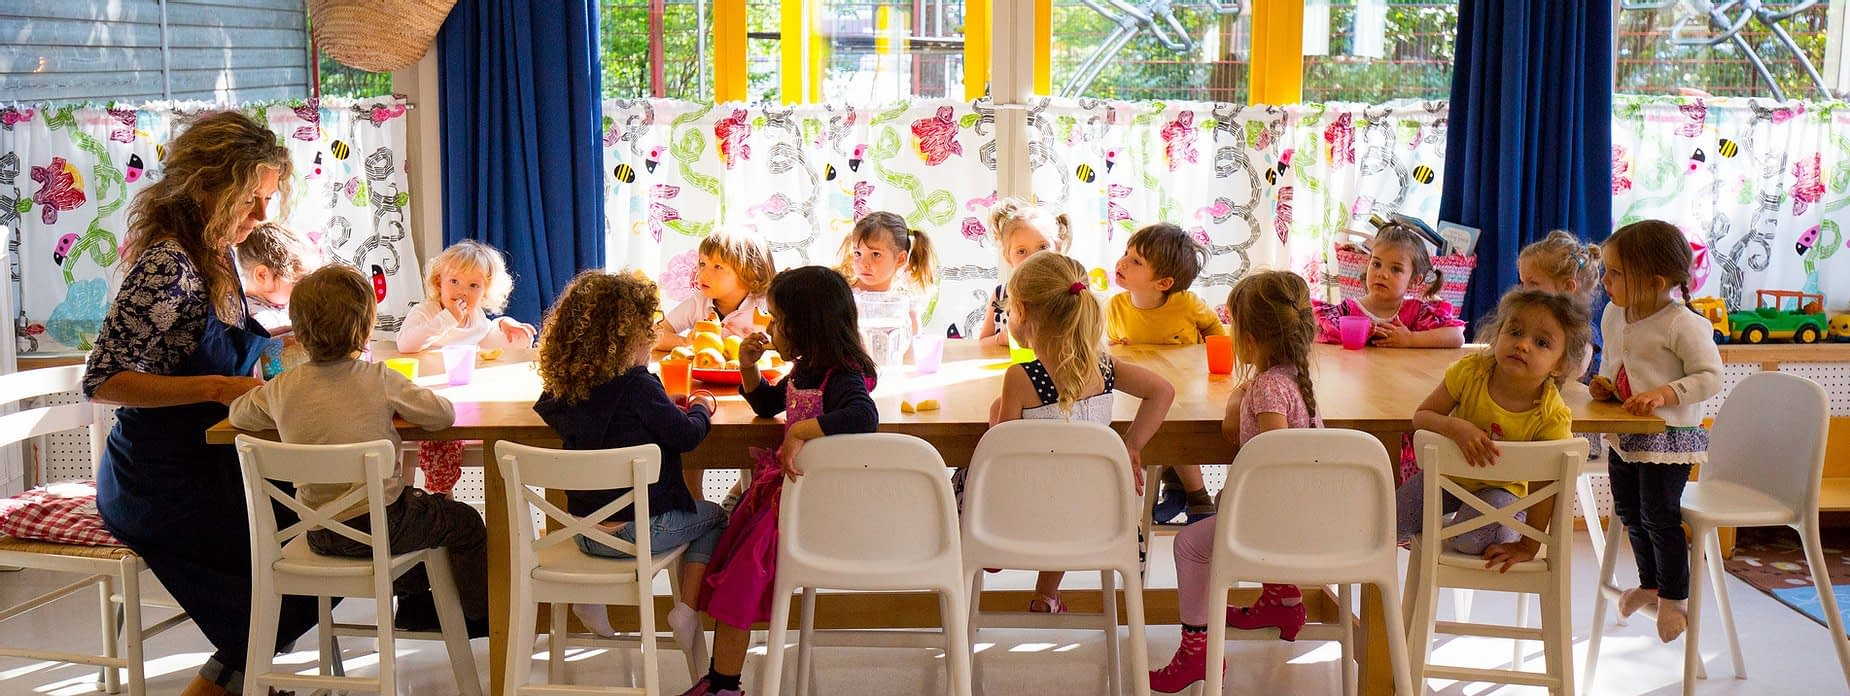 Crèche garderie childcare kinderopvang